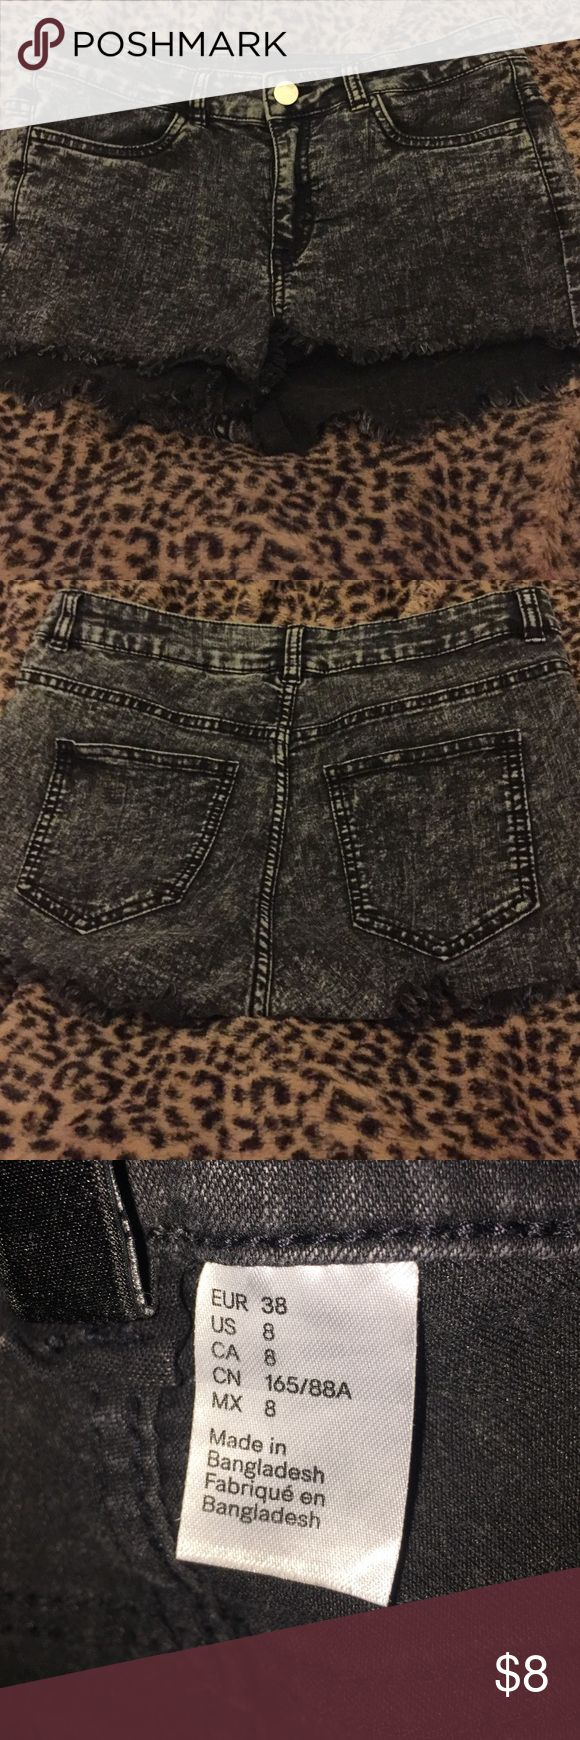 Black acid wash Jean shorts size 8 Acid wash stretch Jean shorts size 8 but fits like a size 2-4. Black and distressed Shorts Jean Shorts